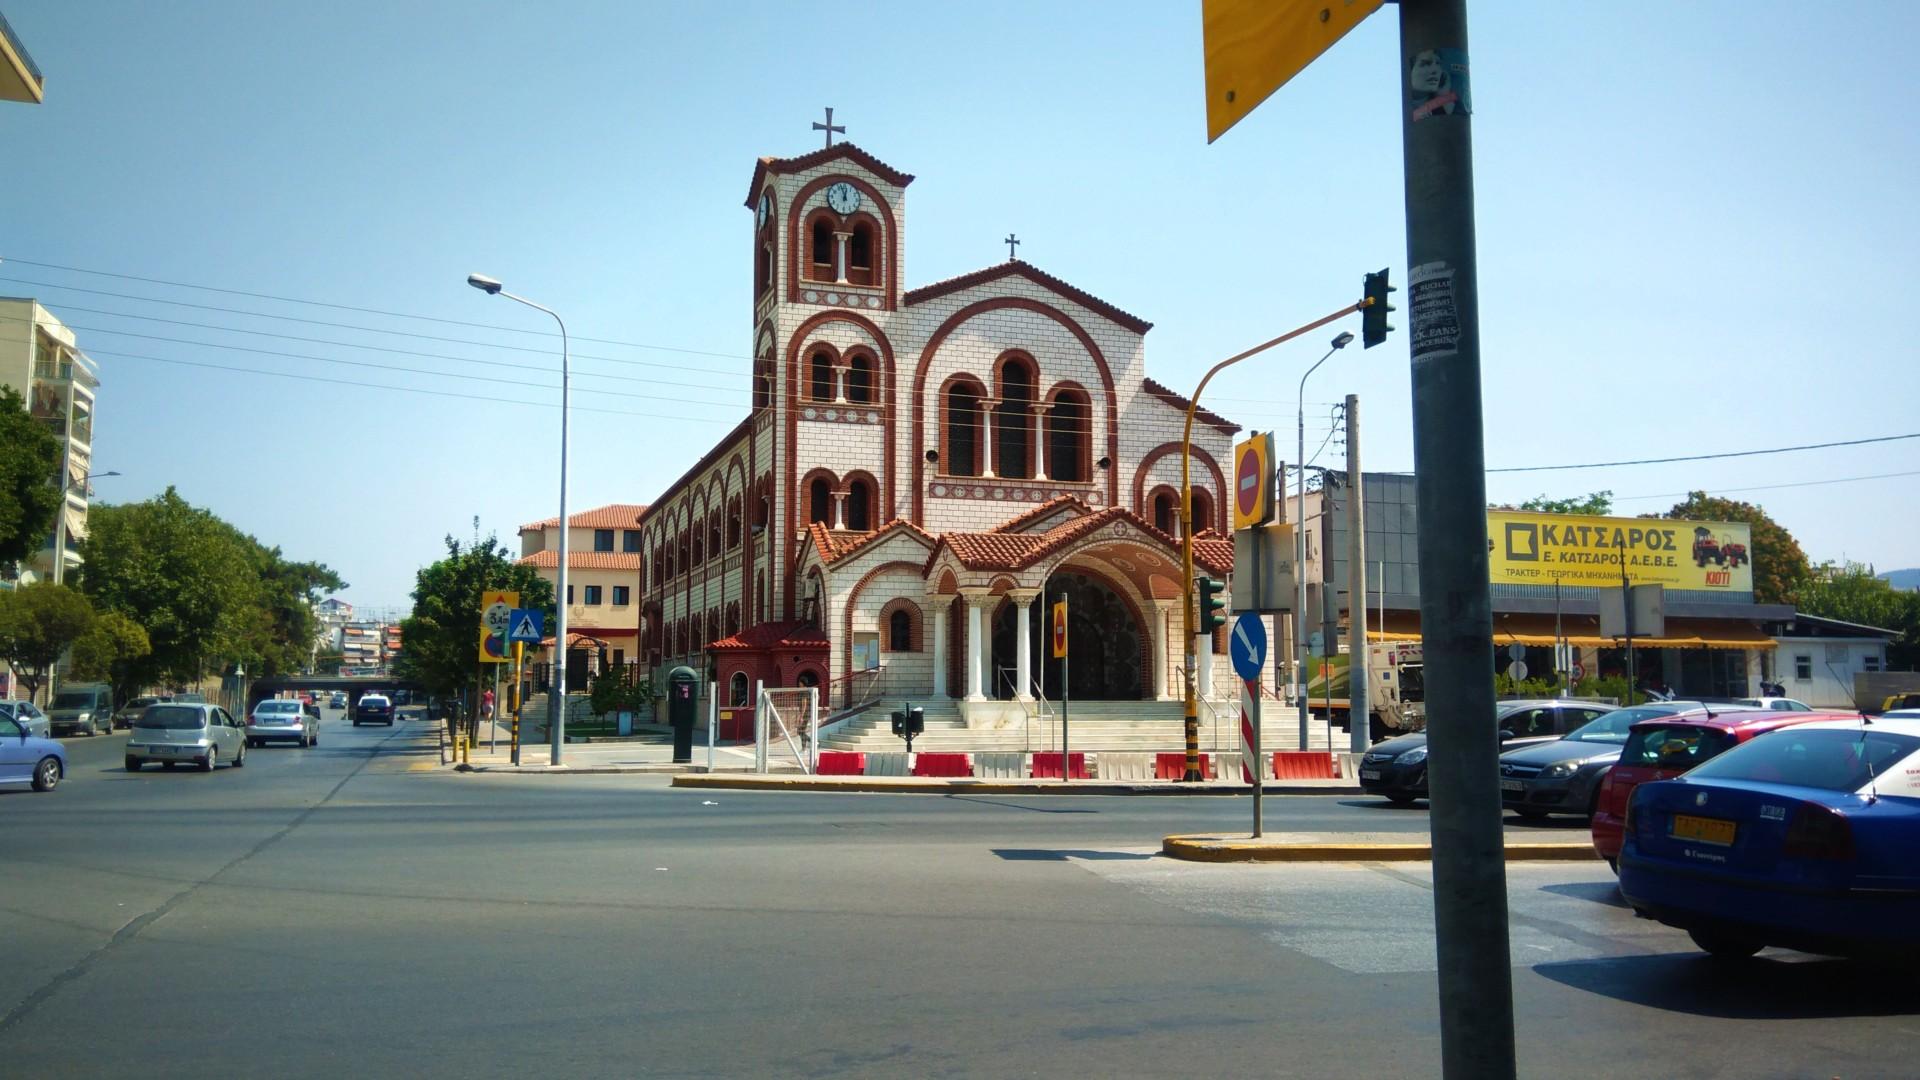 Zachyceno v Thessaloniki